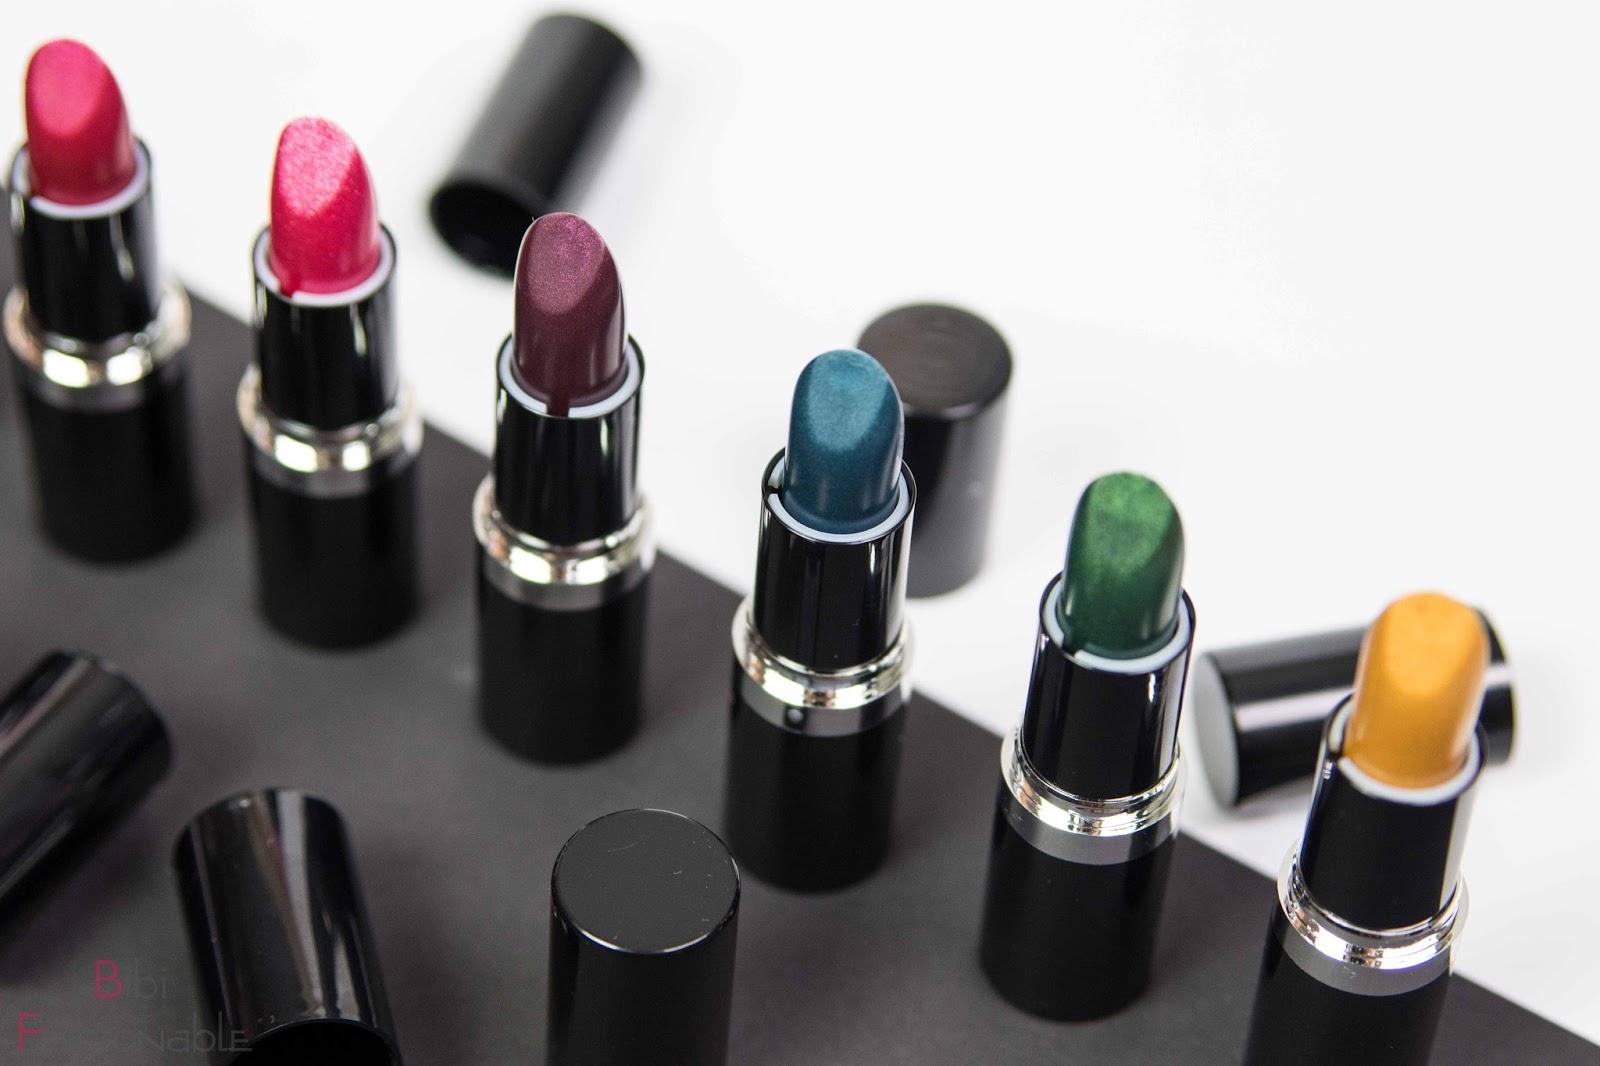 essence metal Shock lipsticks oben